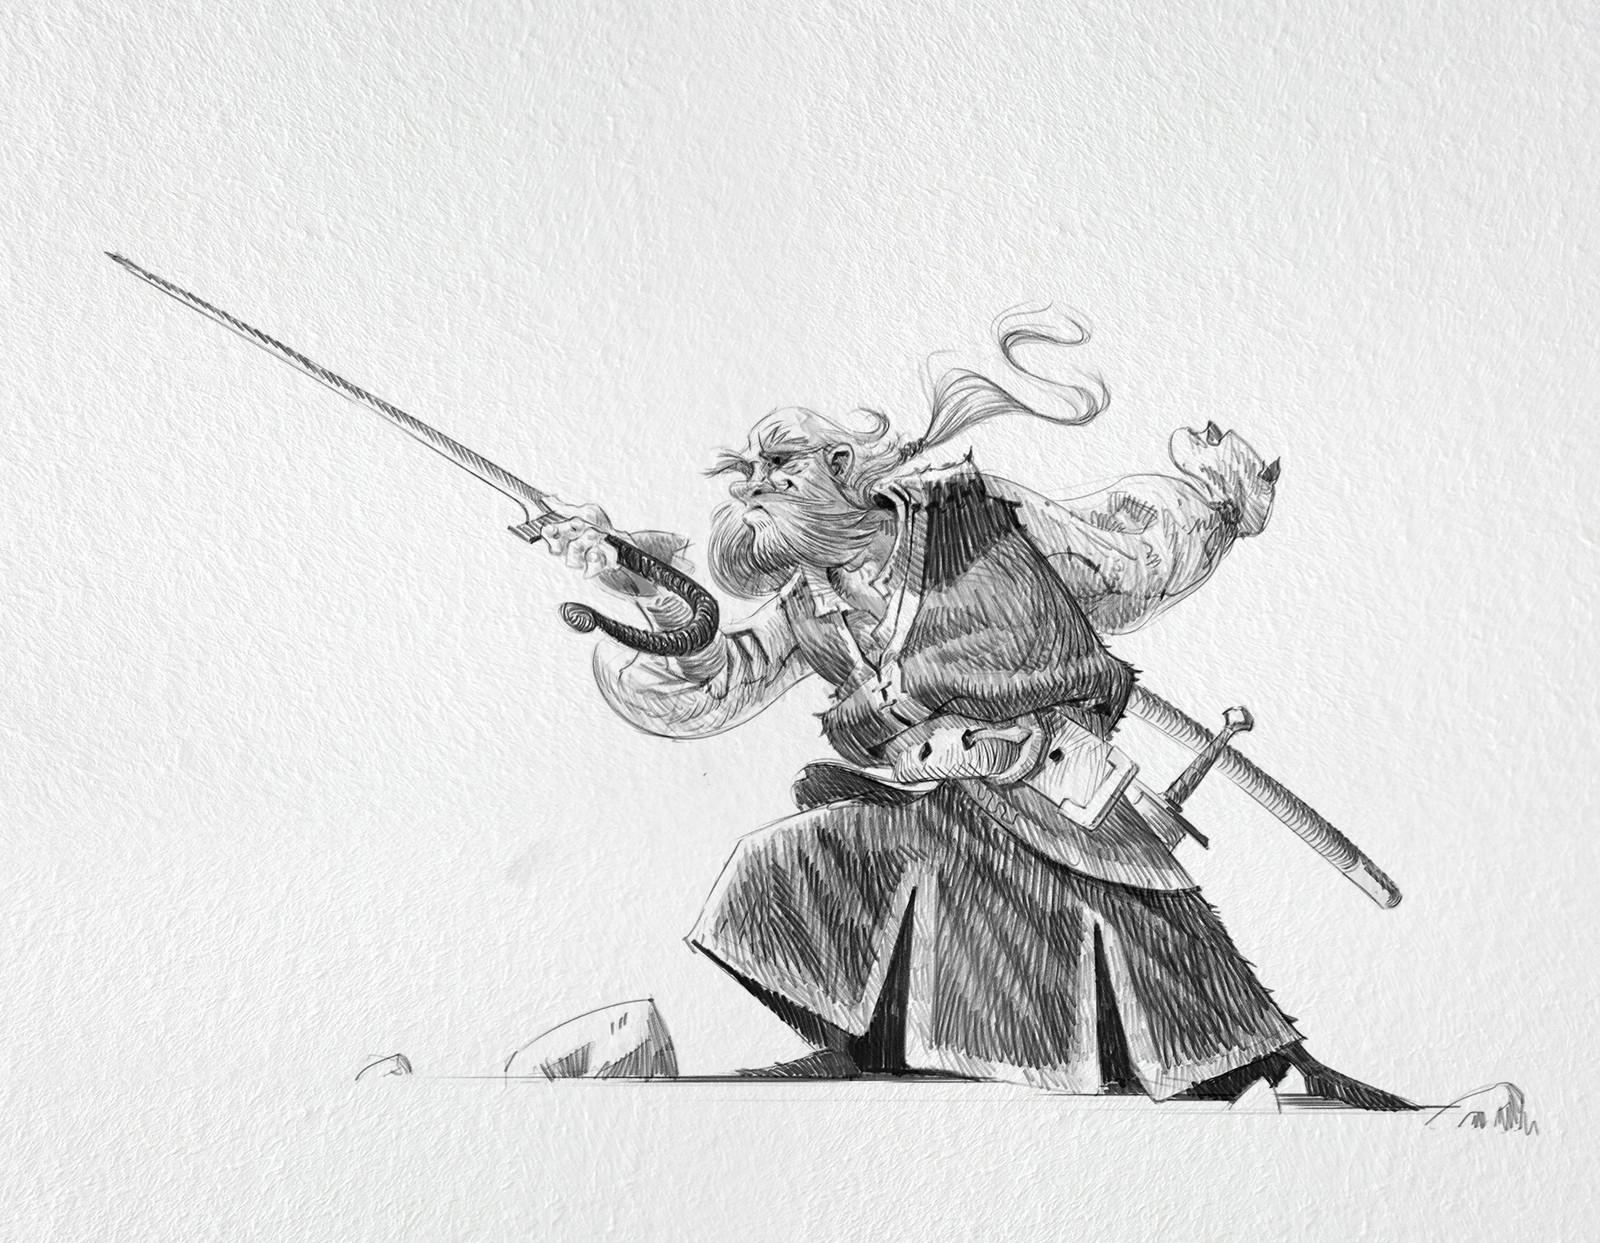 Bobadour, headmaster of the school and legendary swordsman